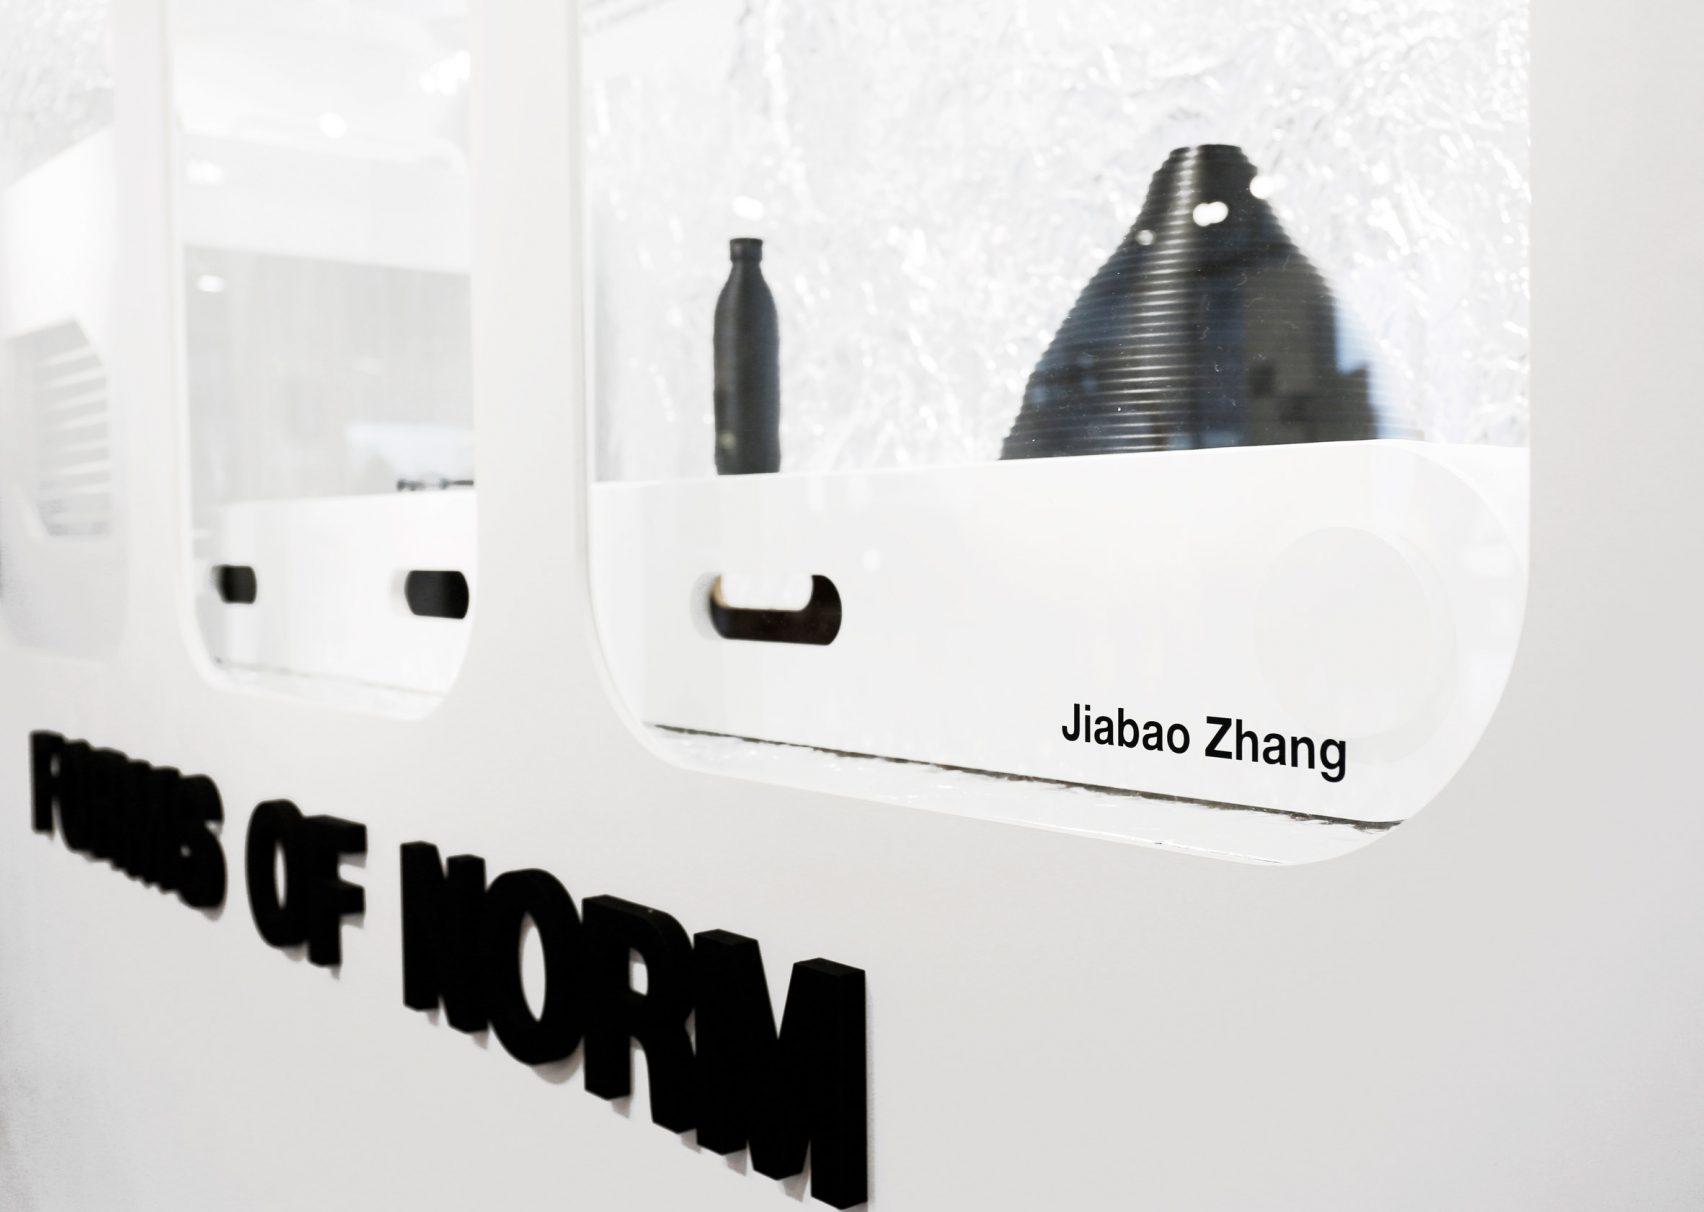 jiabao-zhang-royal-college-of-art-1